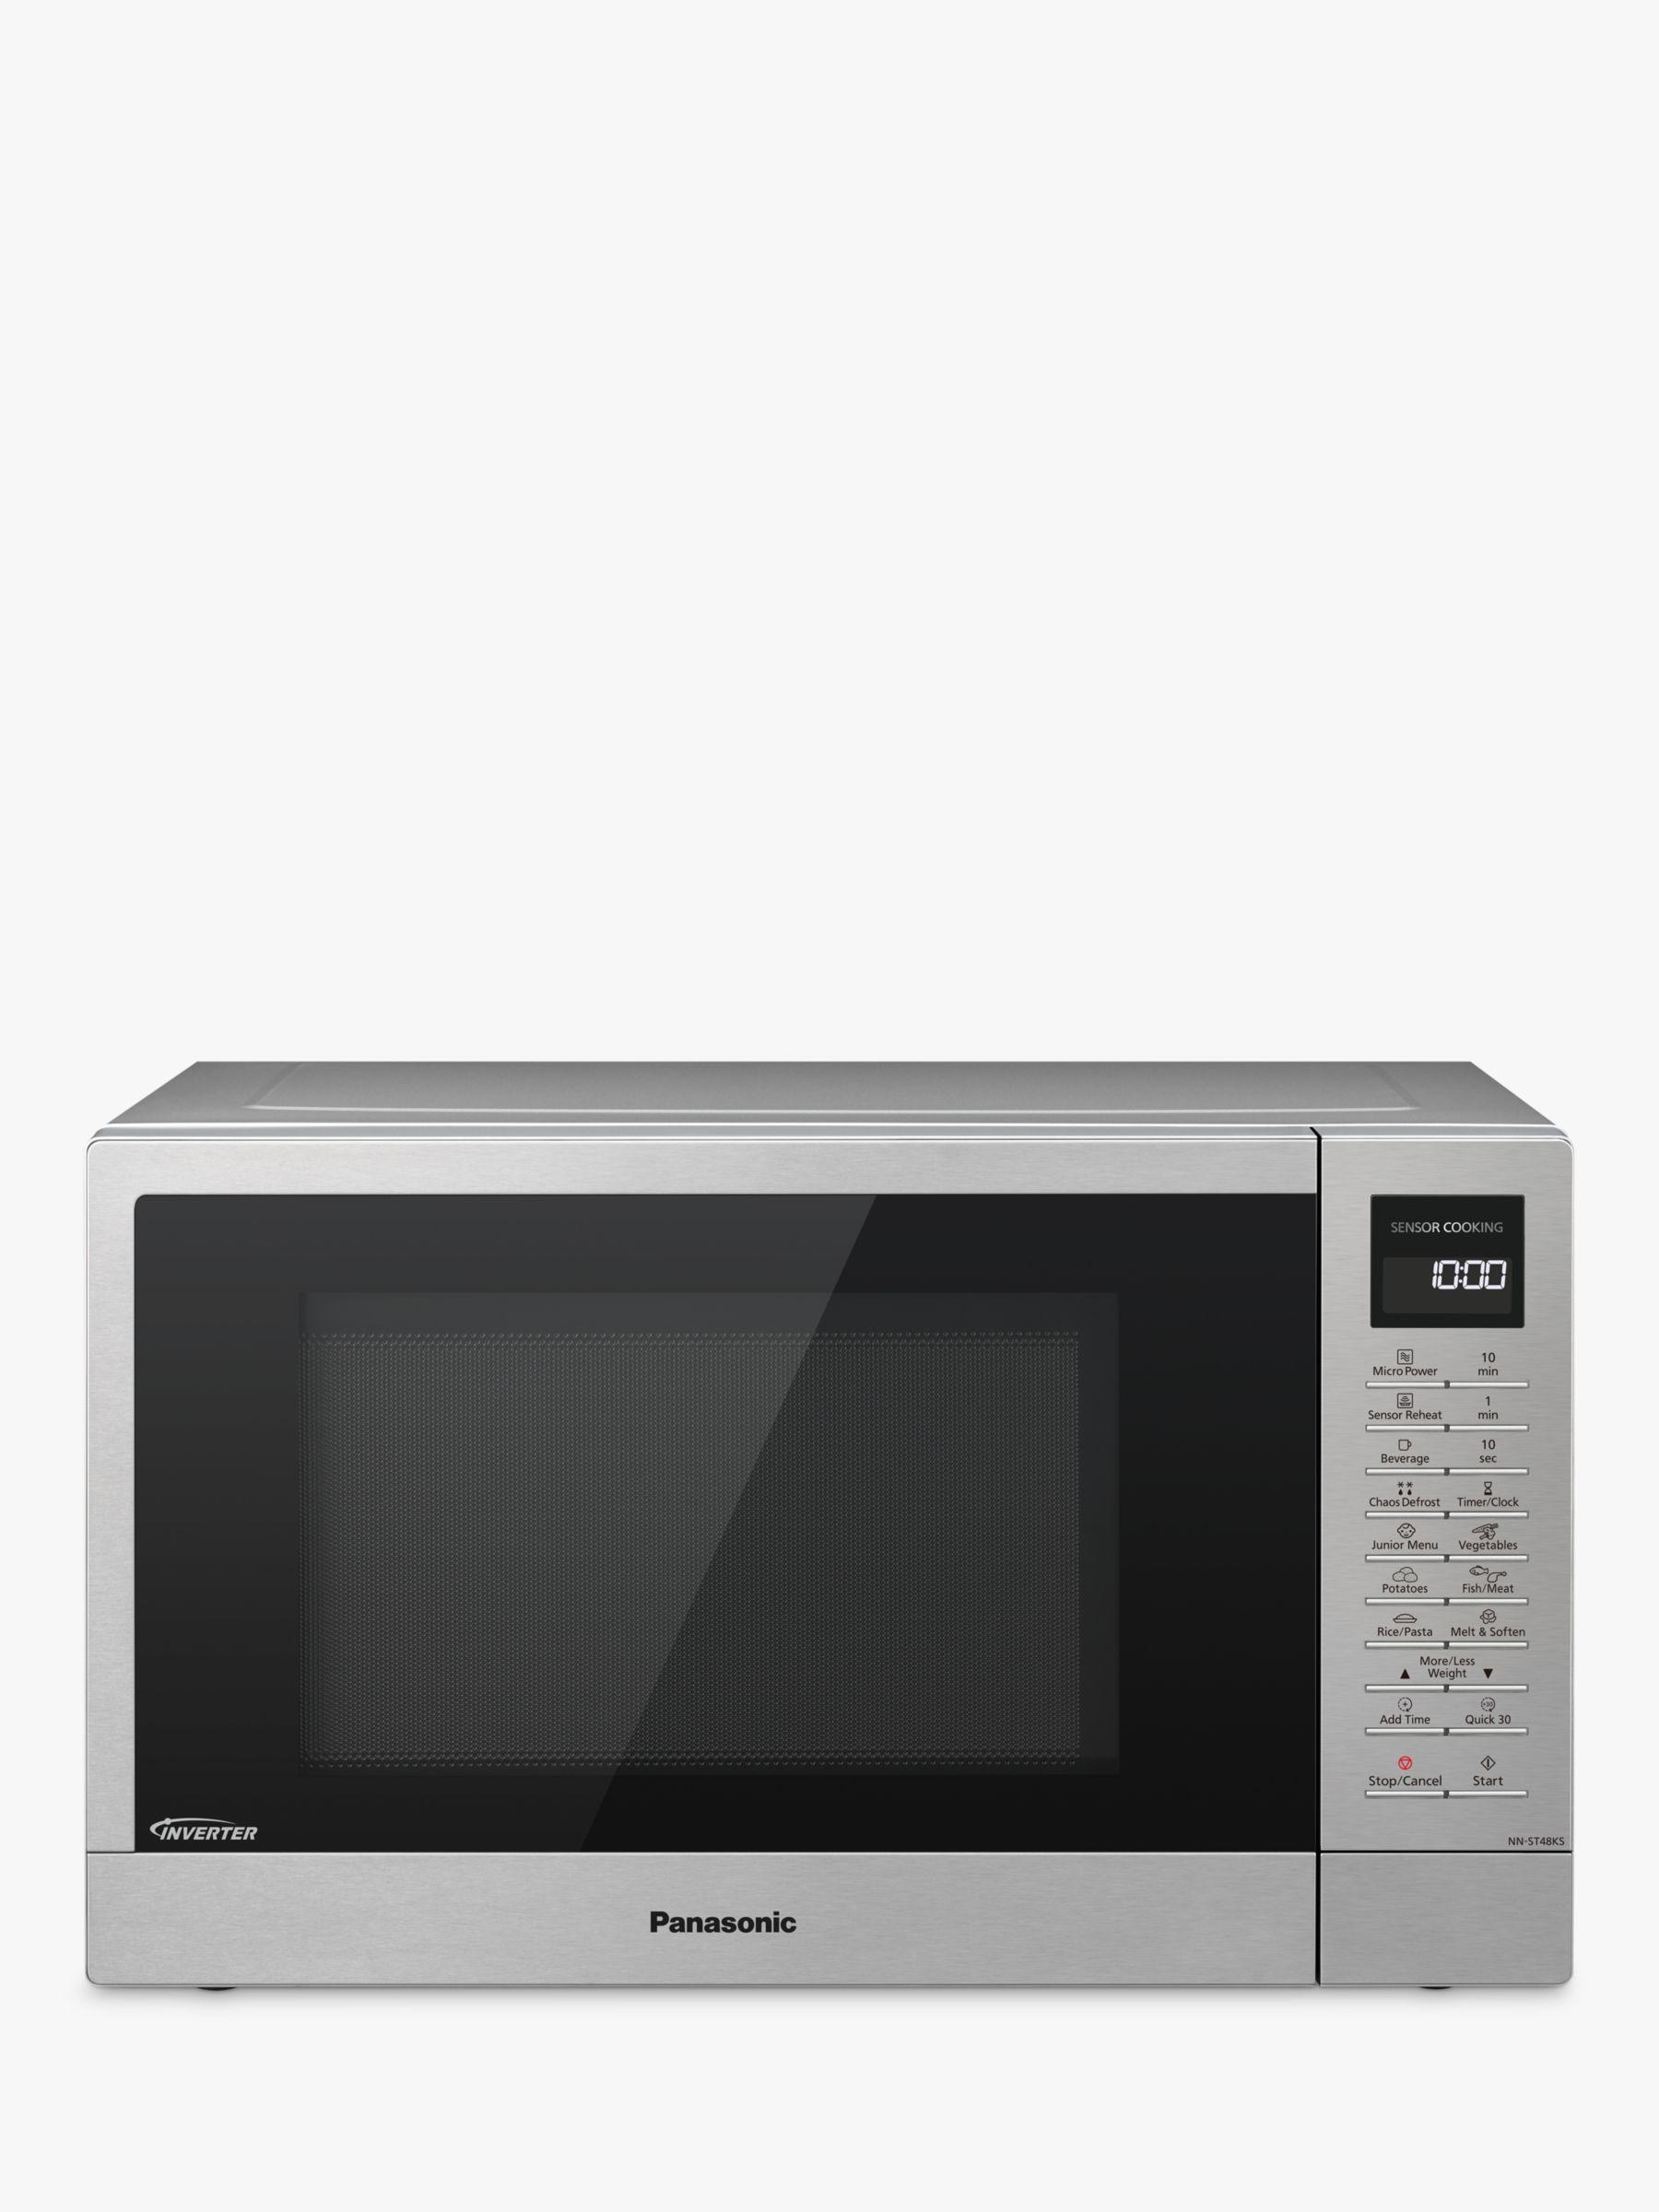 Panasonic Panasonic NN-ST48KSBPQ Freestanding Microwave, Stainless Steel